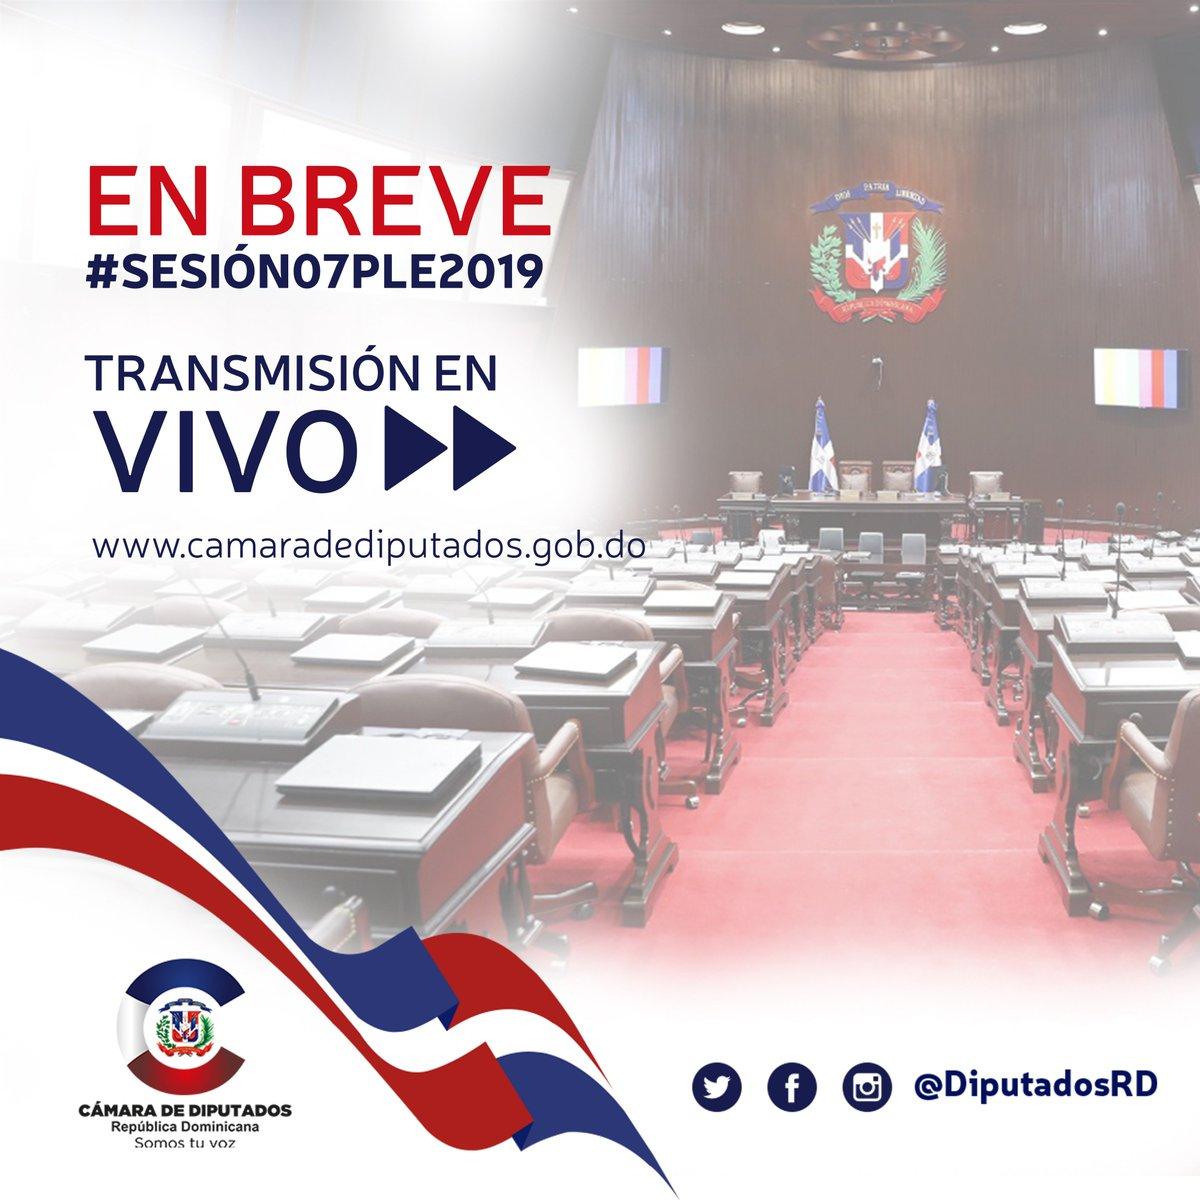 Cámara de Diputados's photo on You Tube